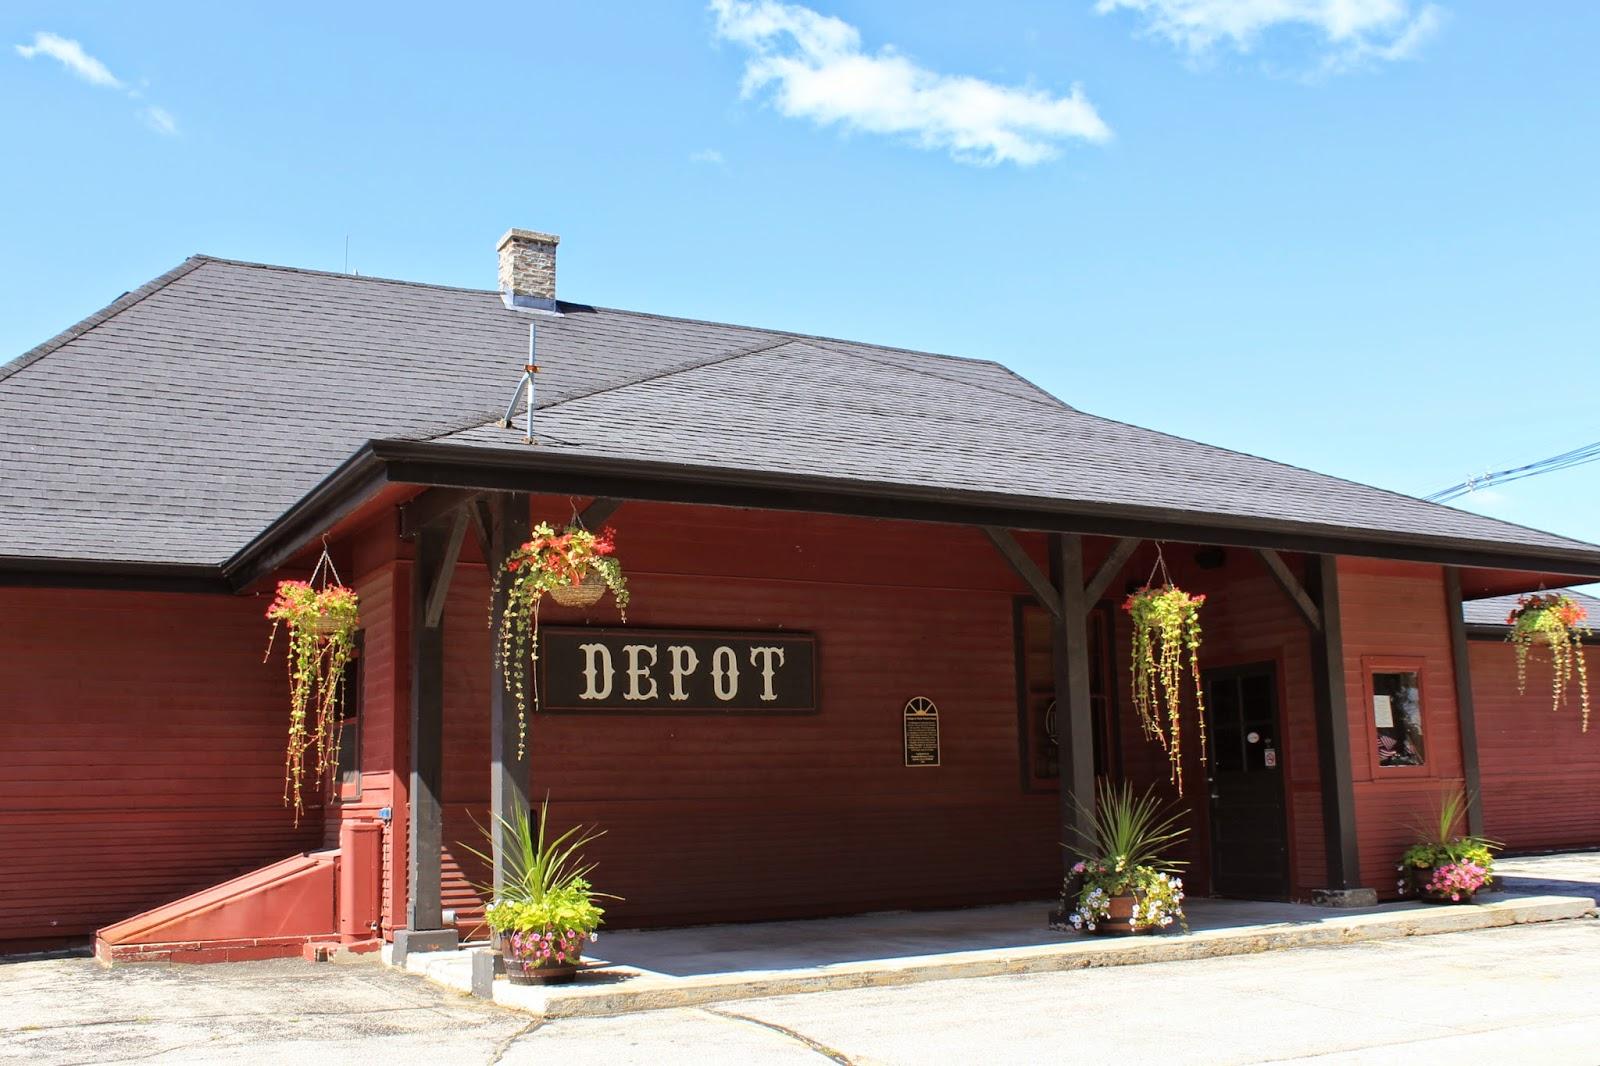 Restaurant depot chicago - Club one san francisco